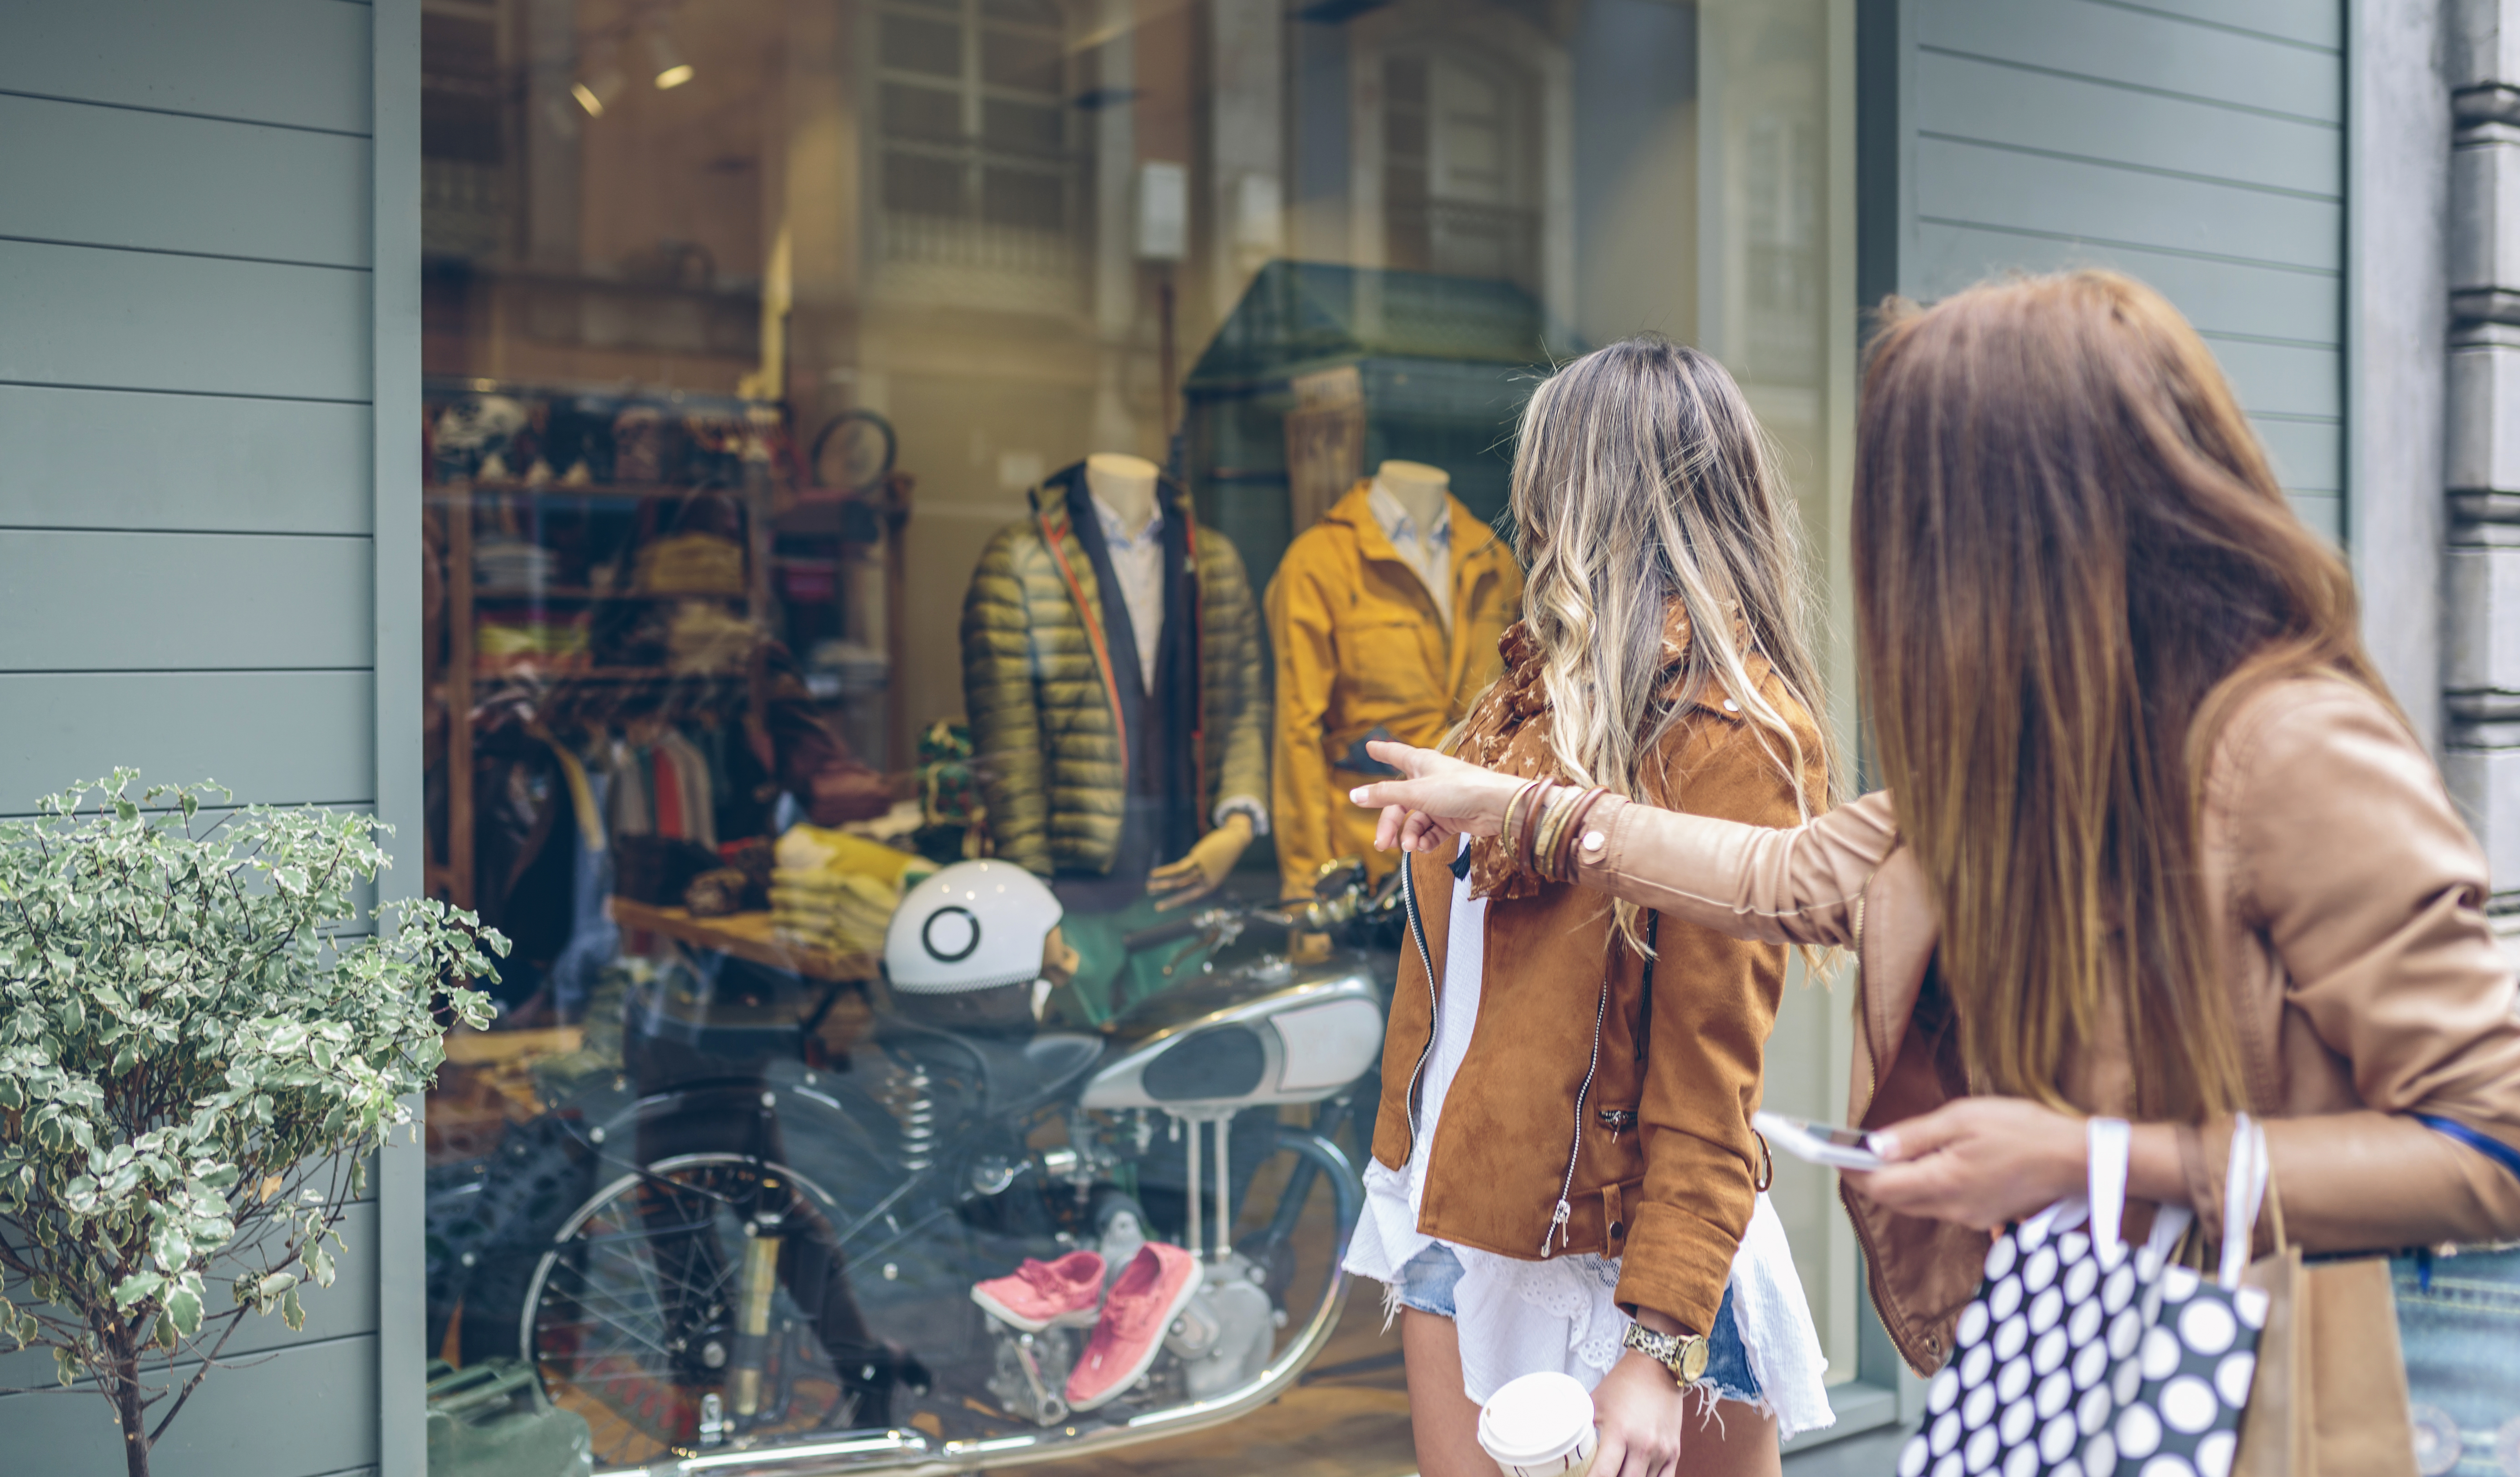 Loja , undefined - Arrendar loja de rua em Lisboa - 9